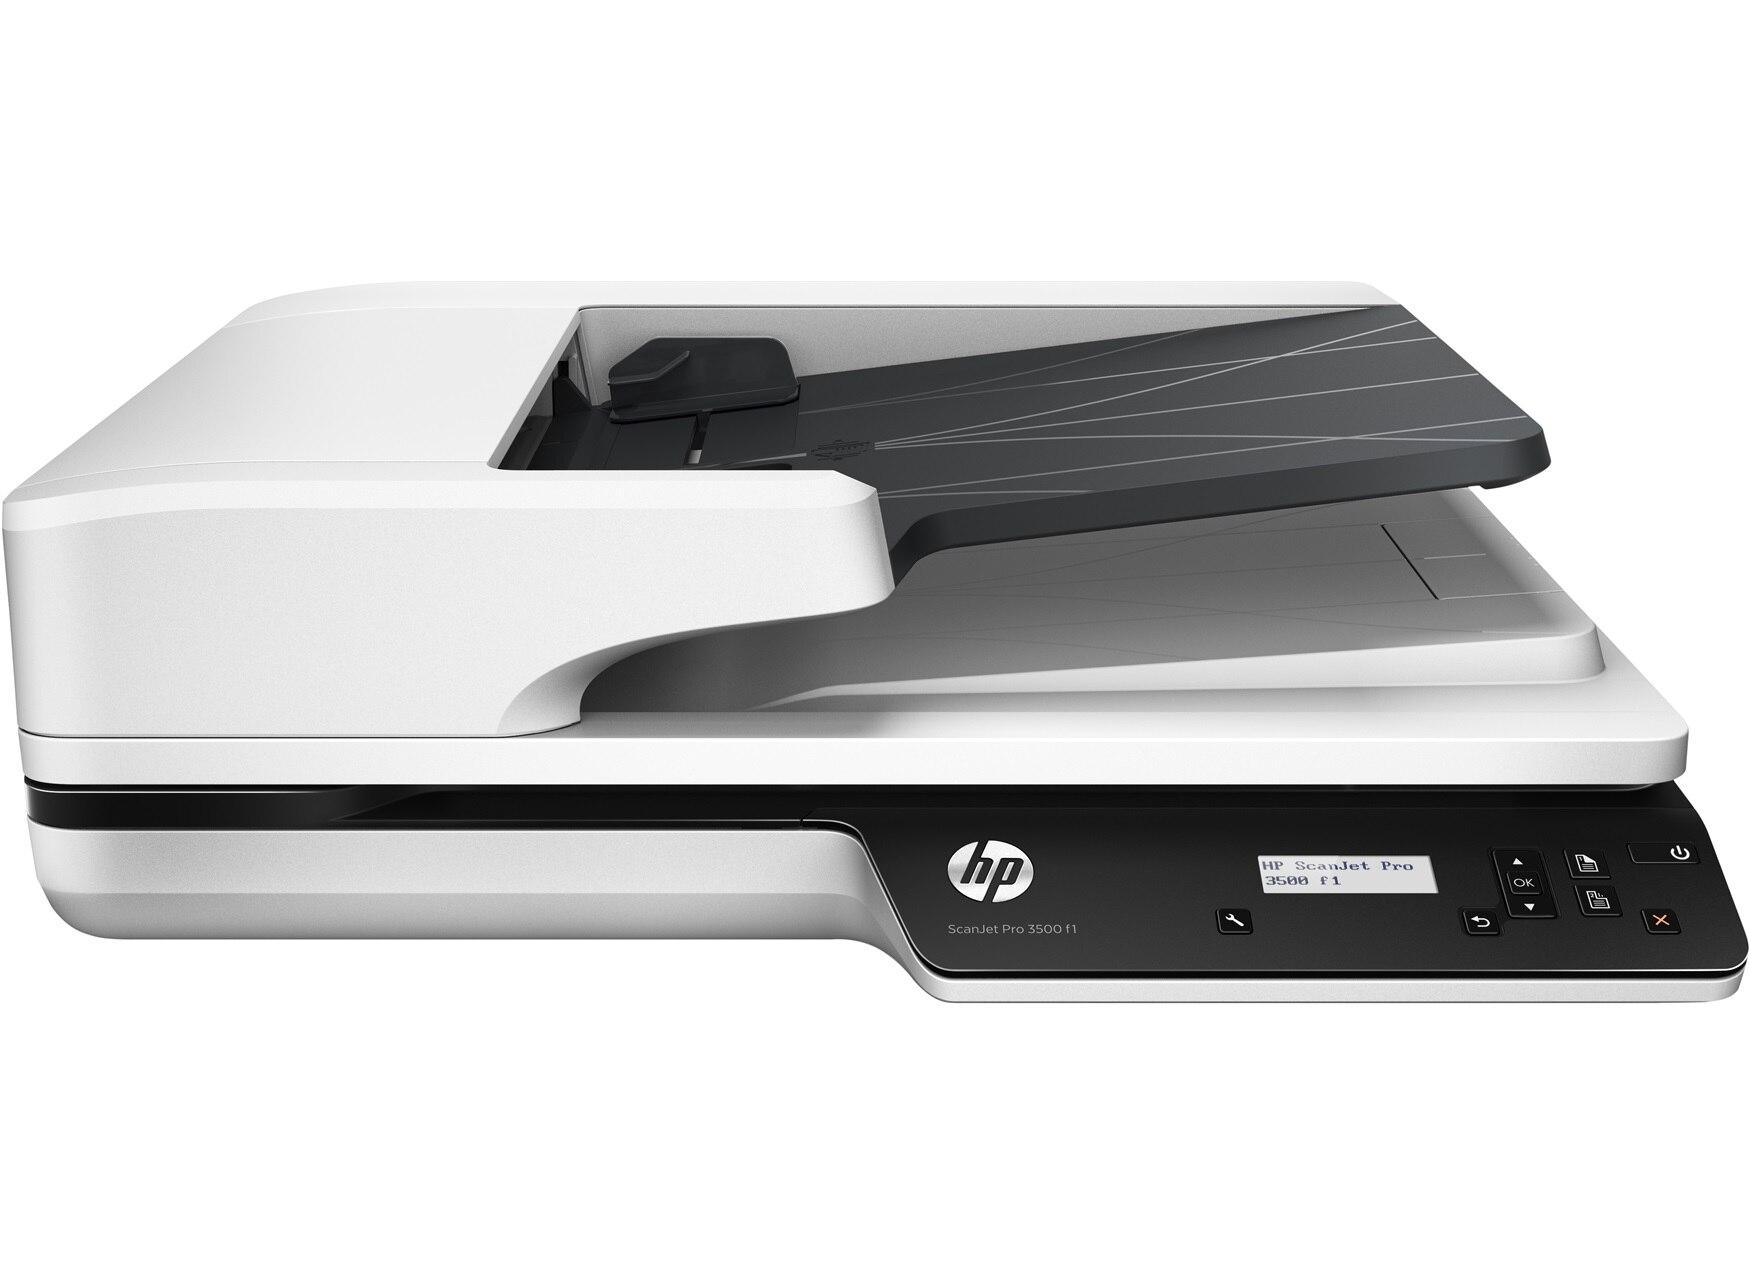 Mejores Escáners HP